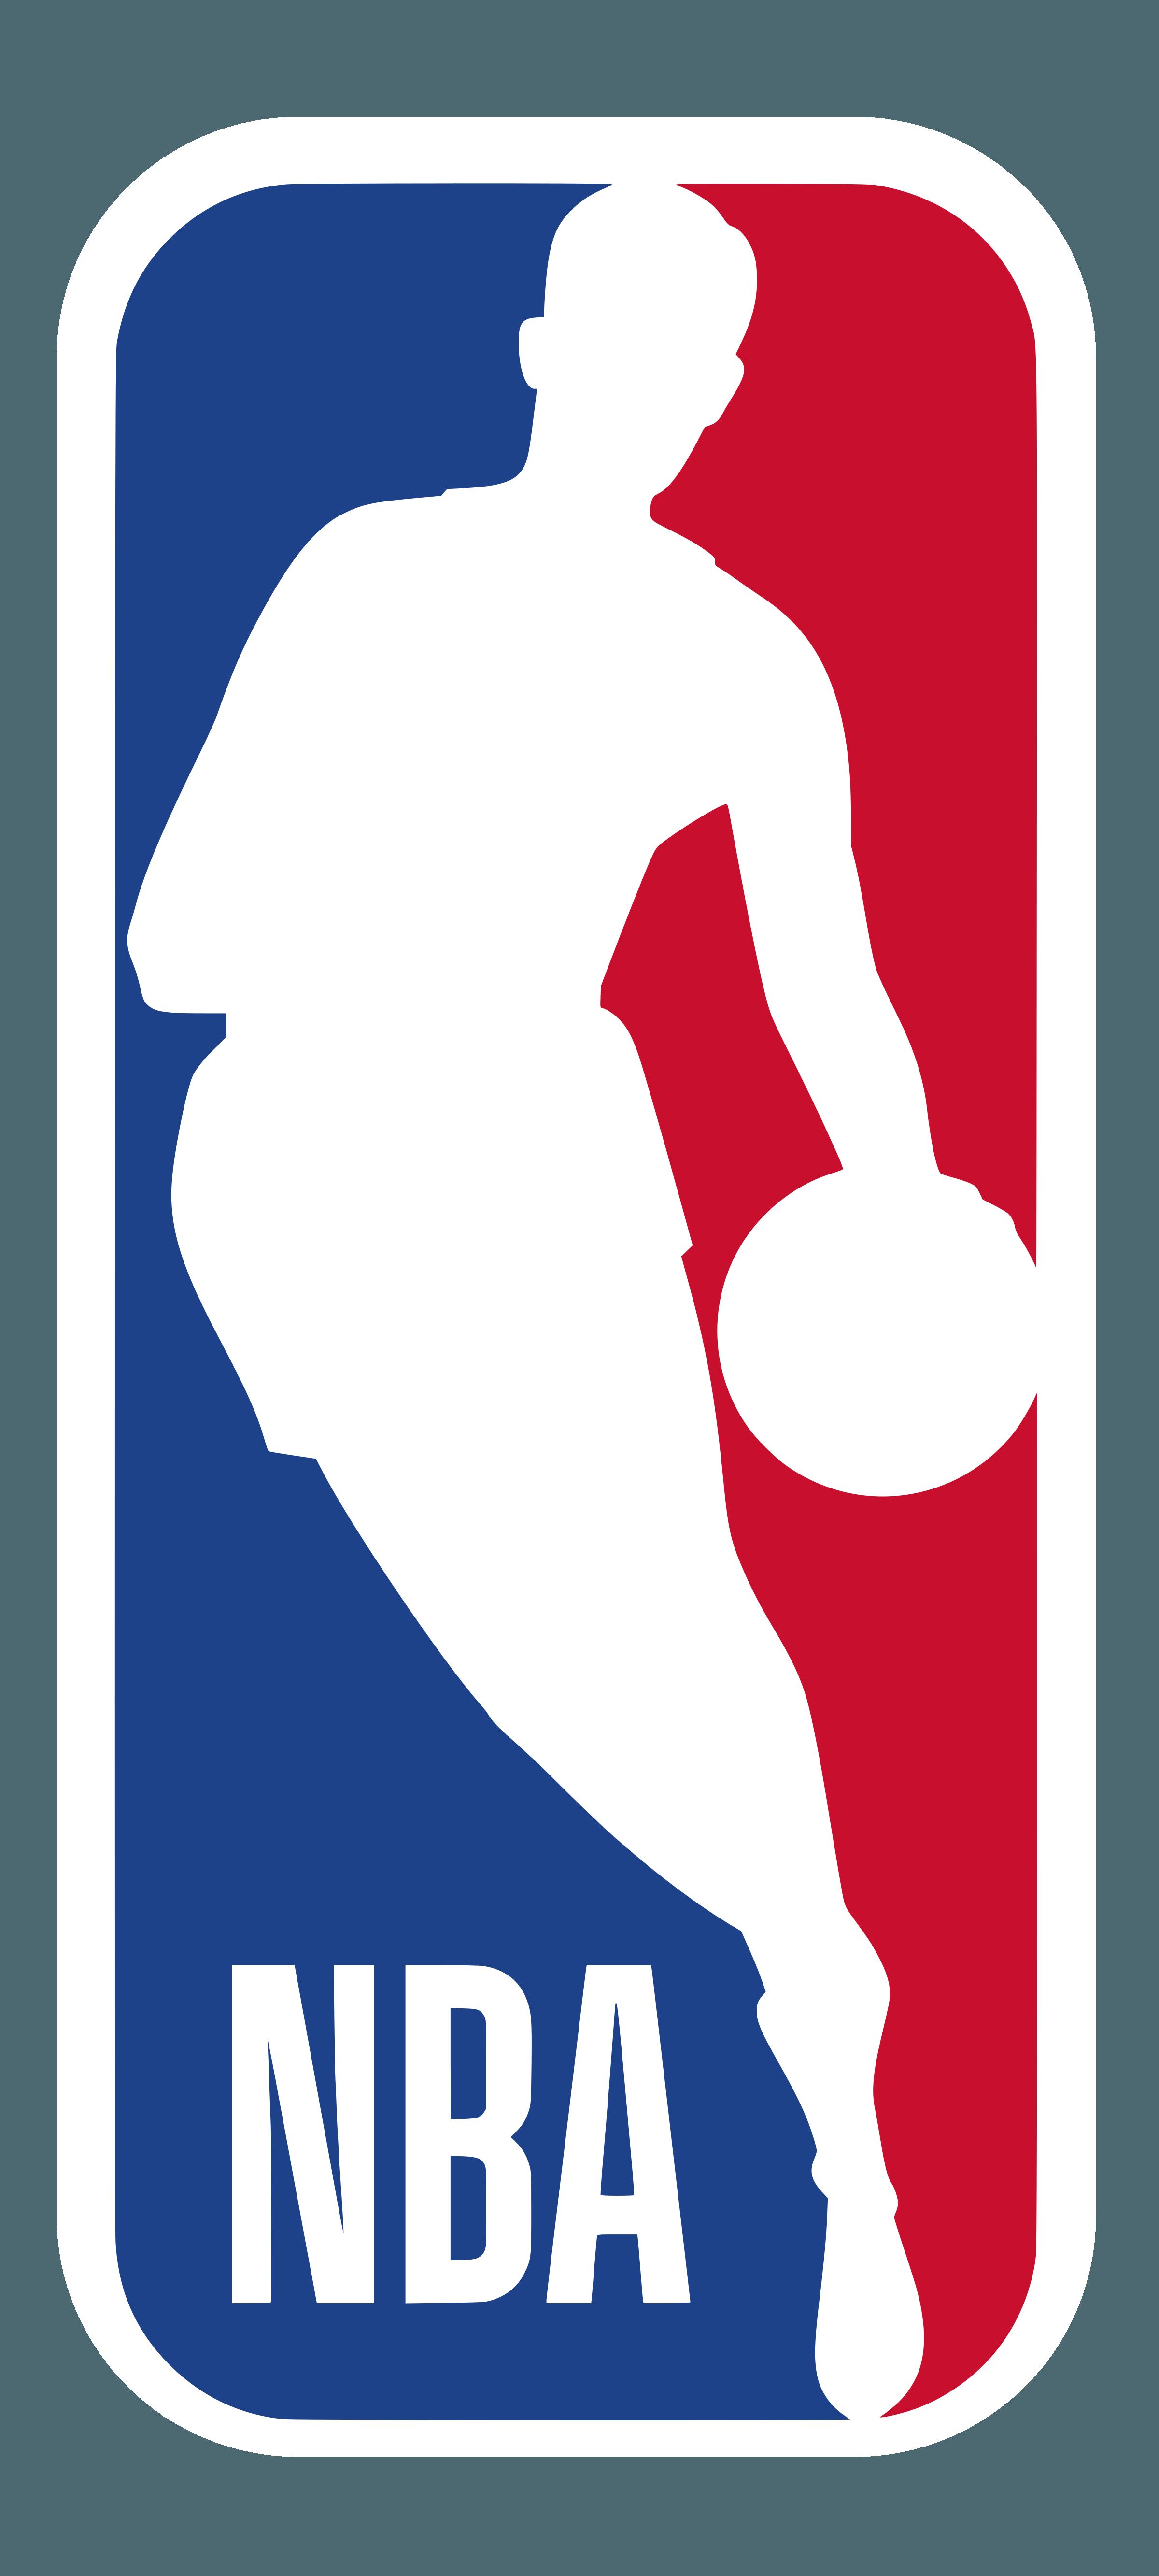 Image result for Nba logo png